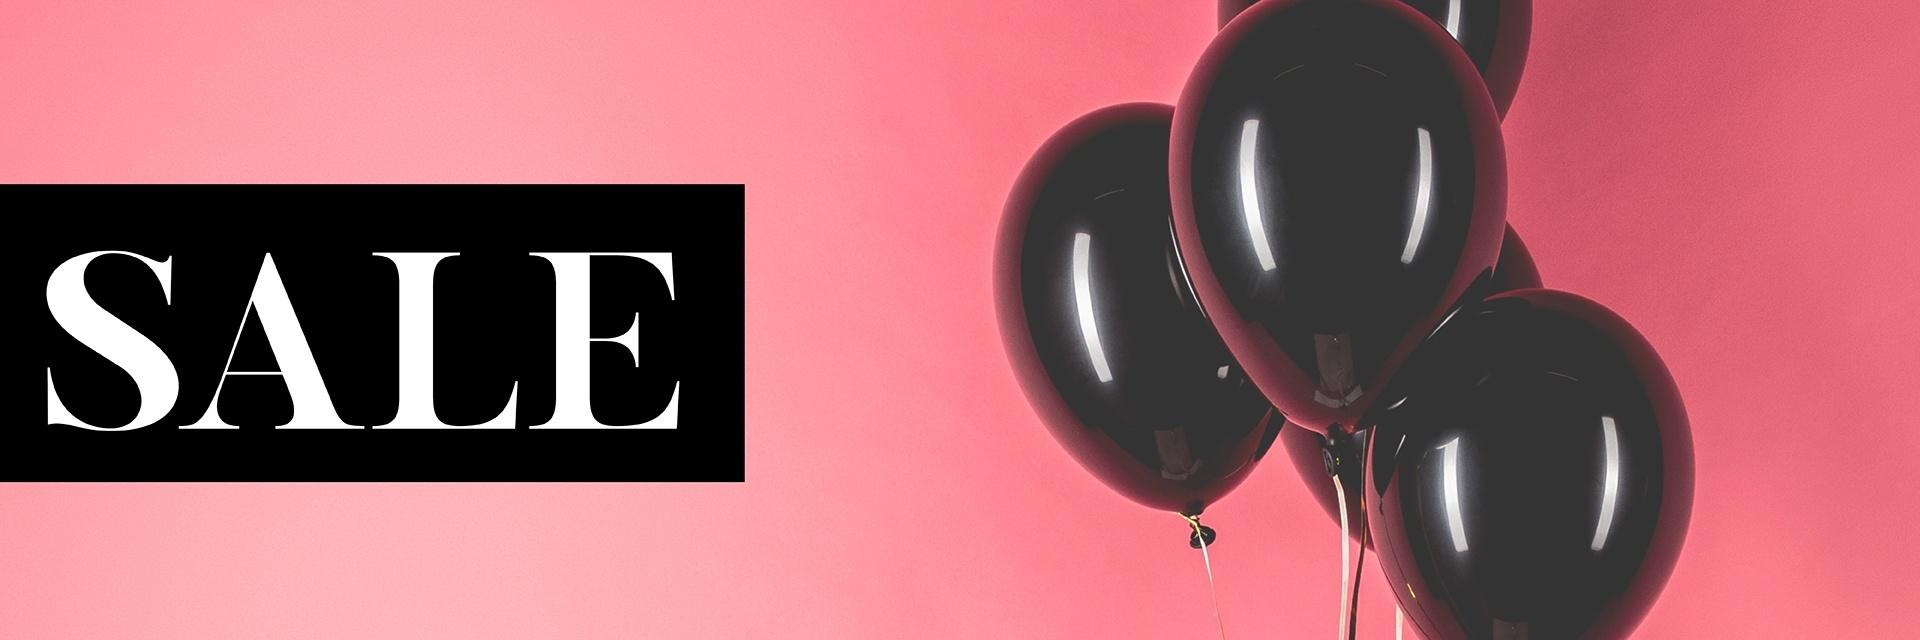 Aktionen/Anlässe - Sale rosa Luftballons